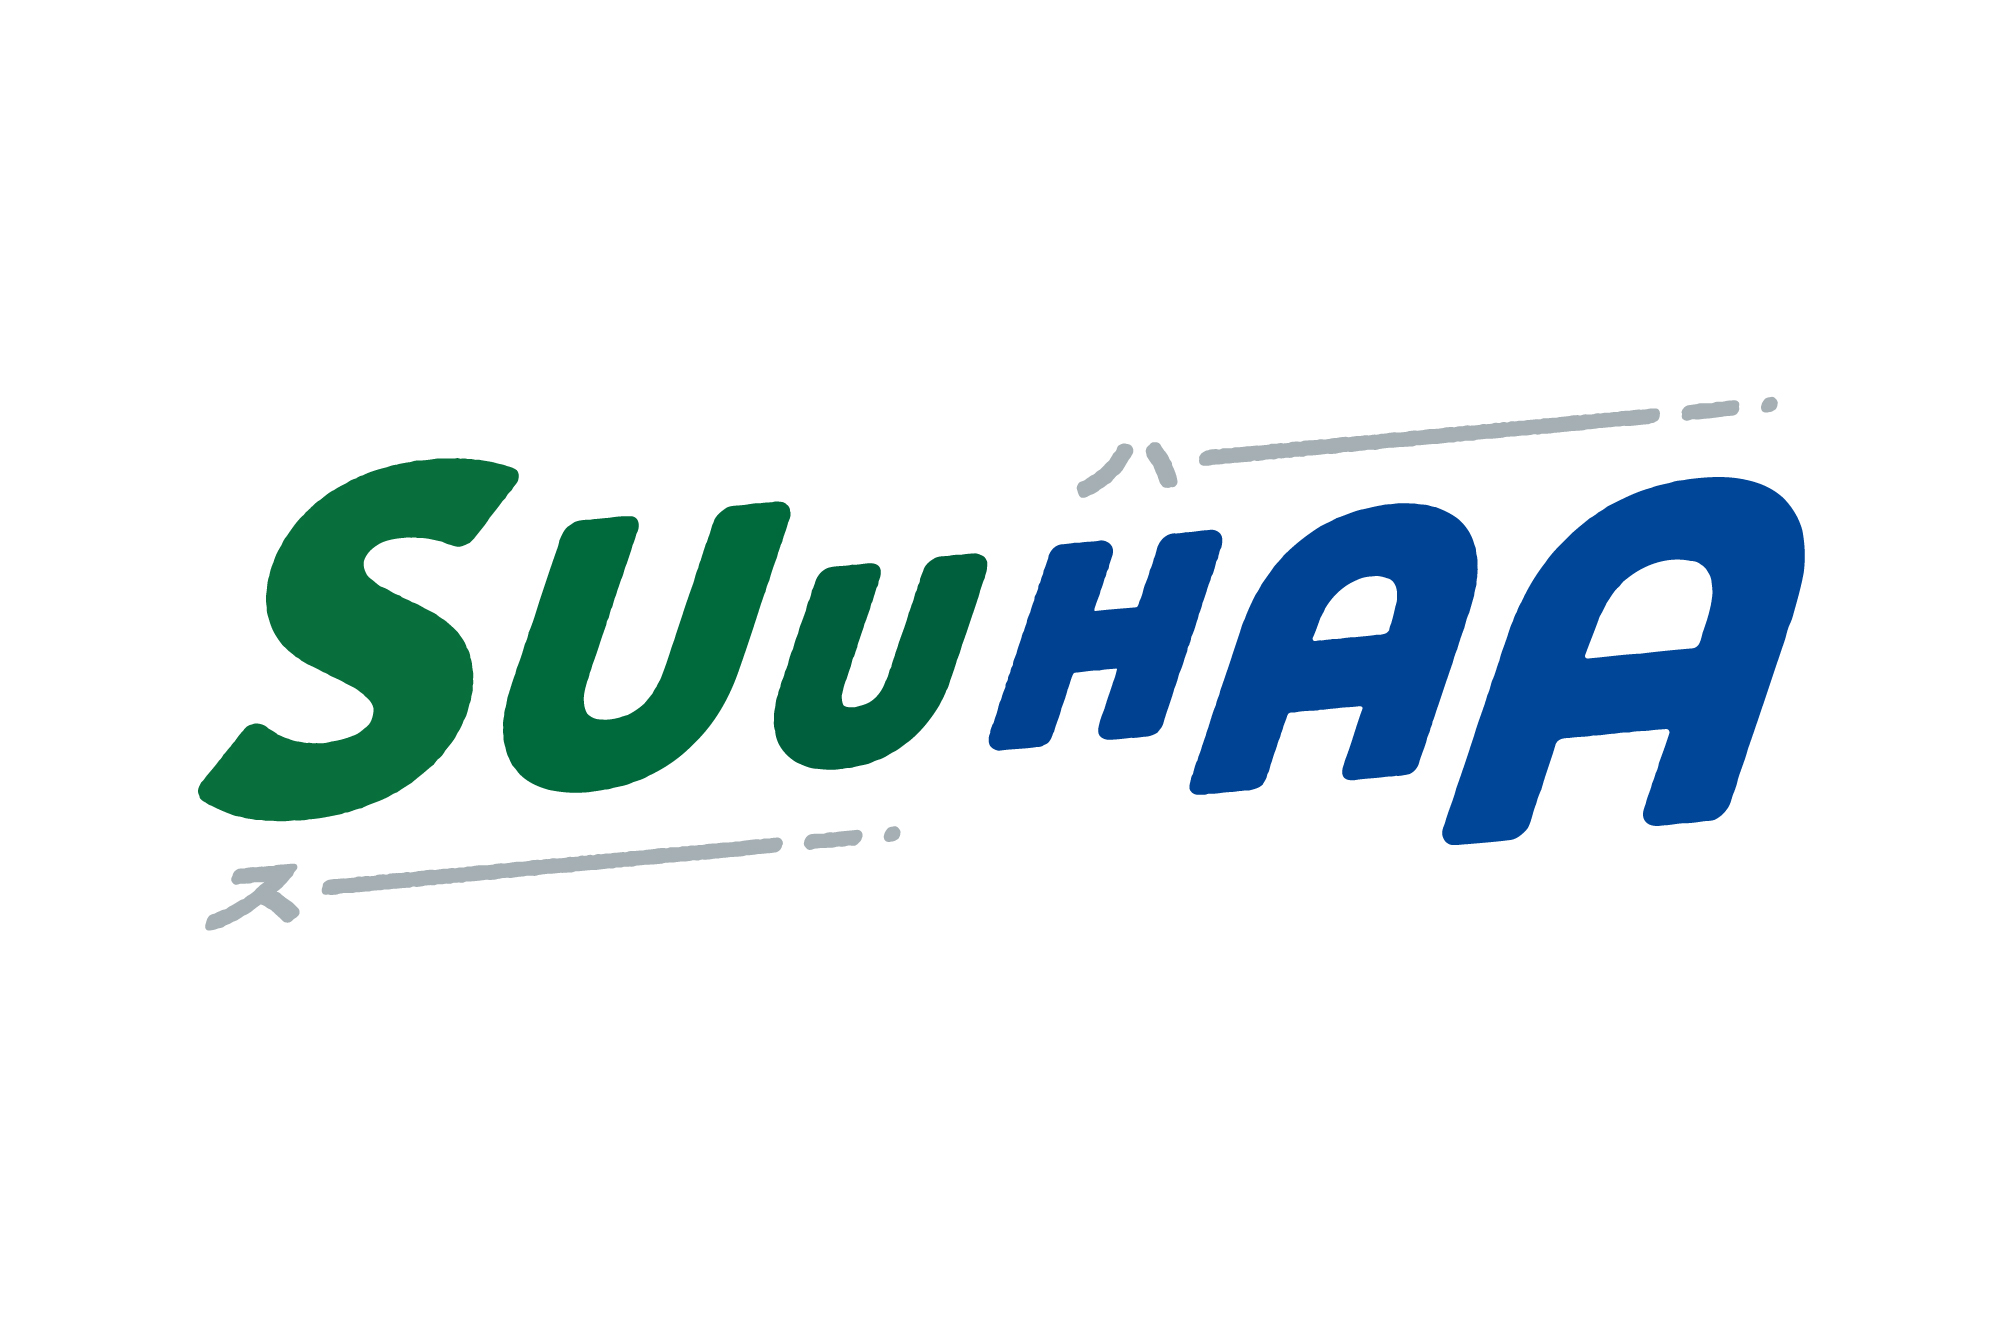 「SuuHaa」好調 移住関係資料求め